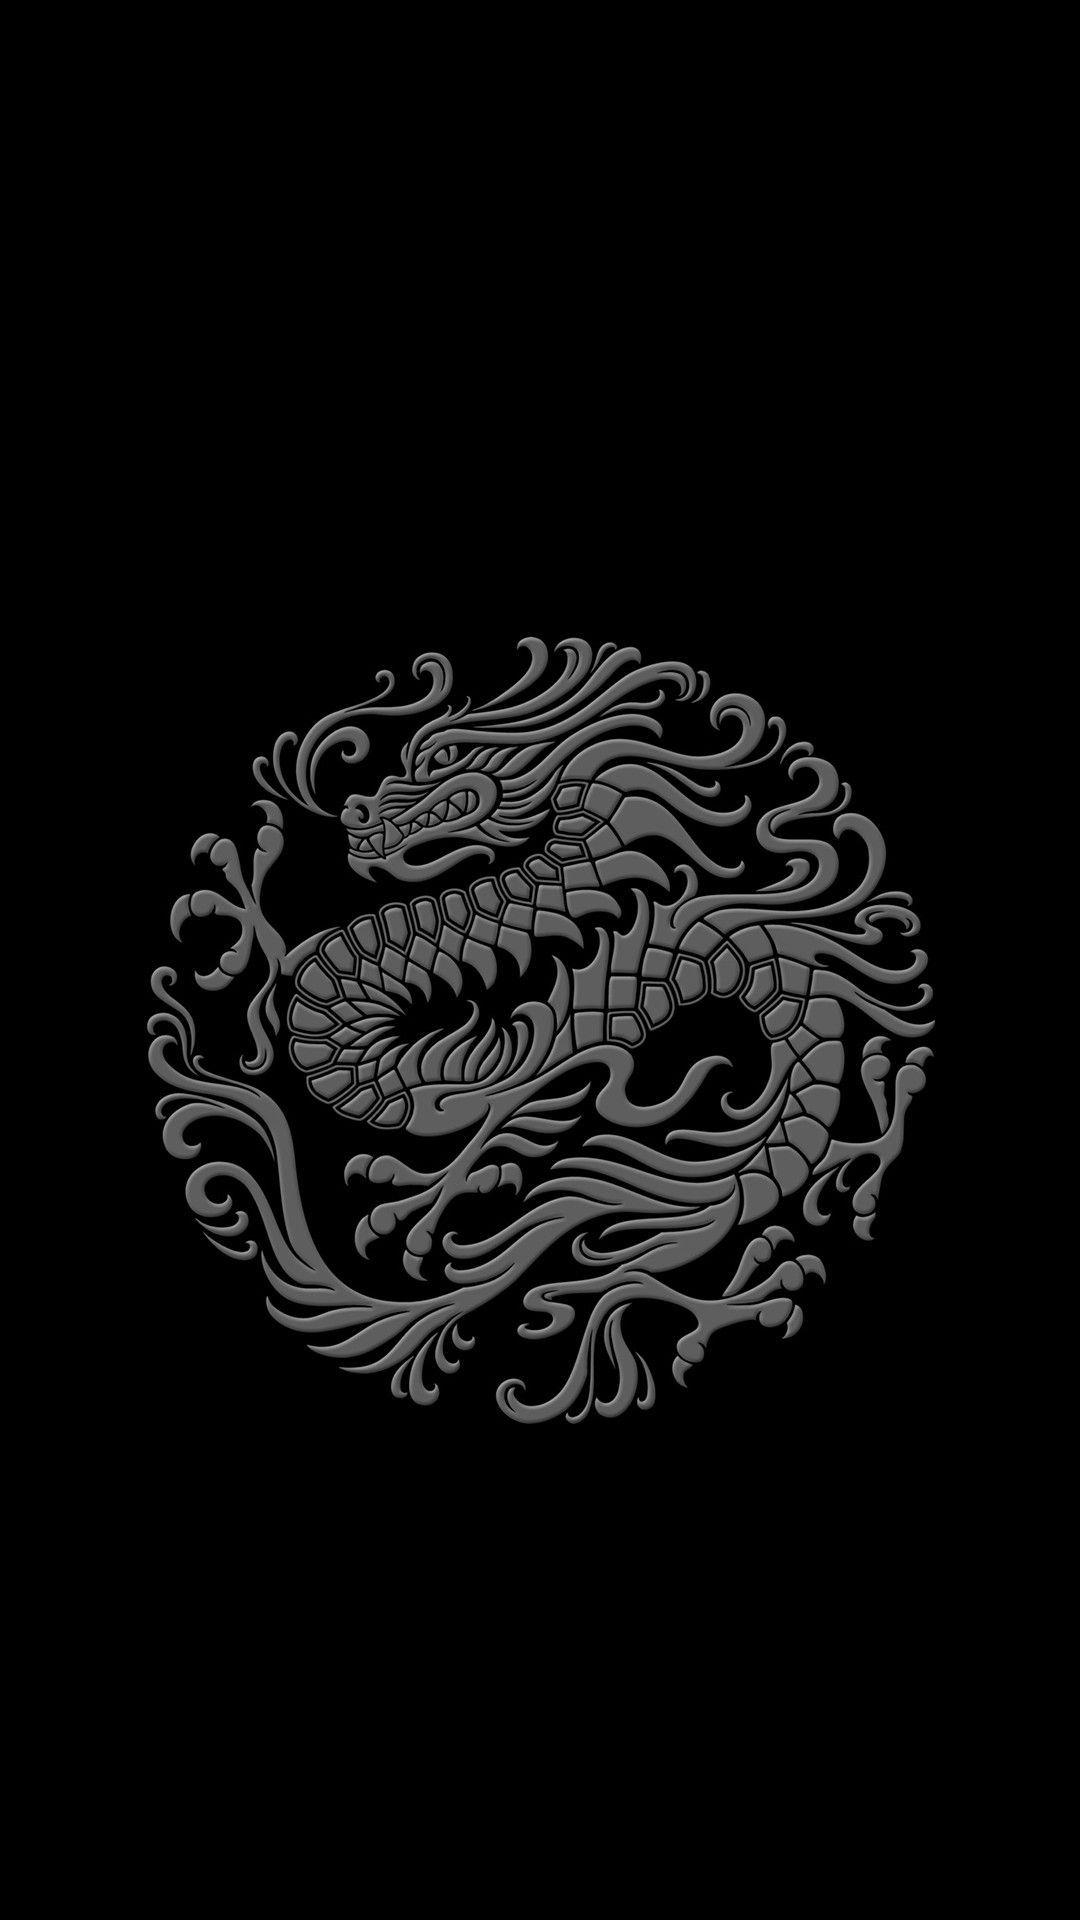 Chinese Dragon Wallpaper Iphone : chinese, dragon, wallpaper, iphone, Chinese, Dragon, Wallpapers, Wallpaper